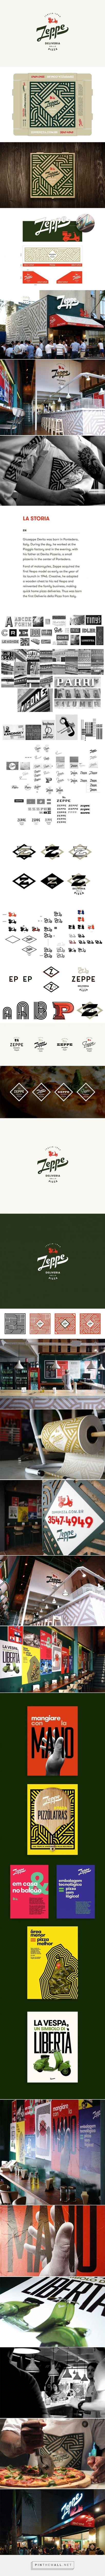 Zeppe-pizza